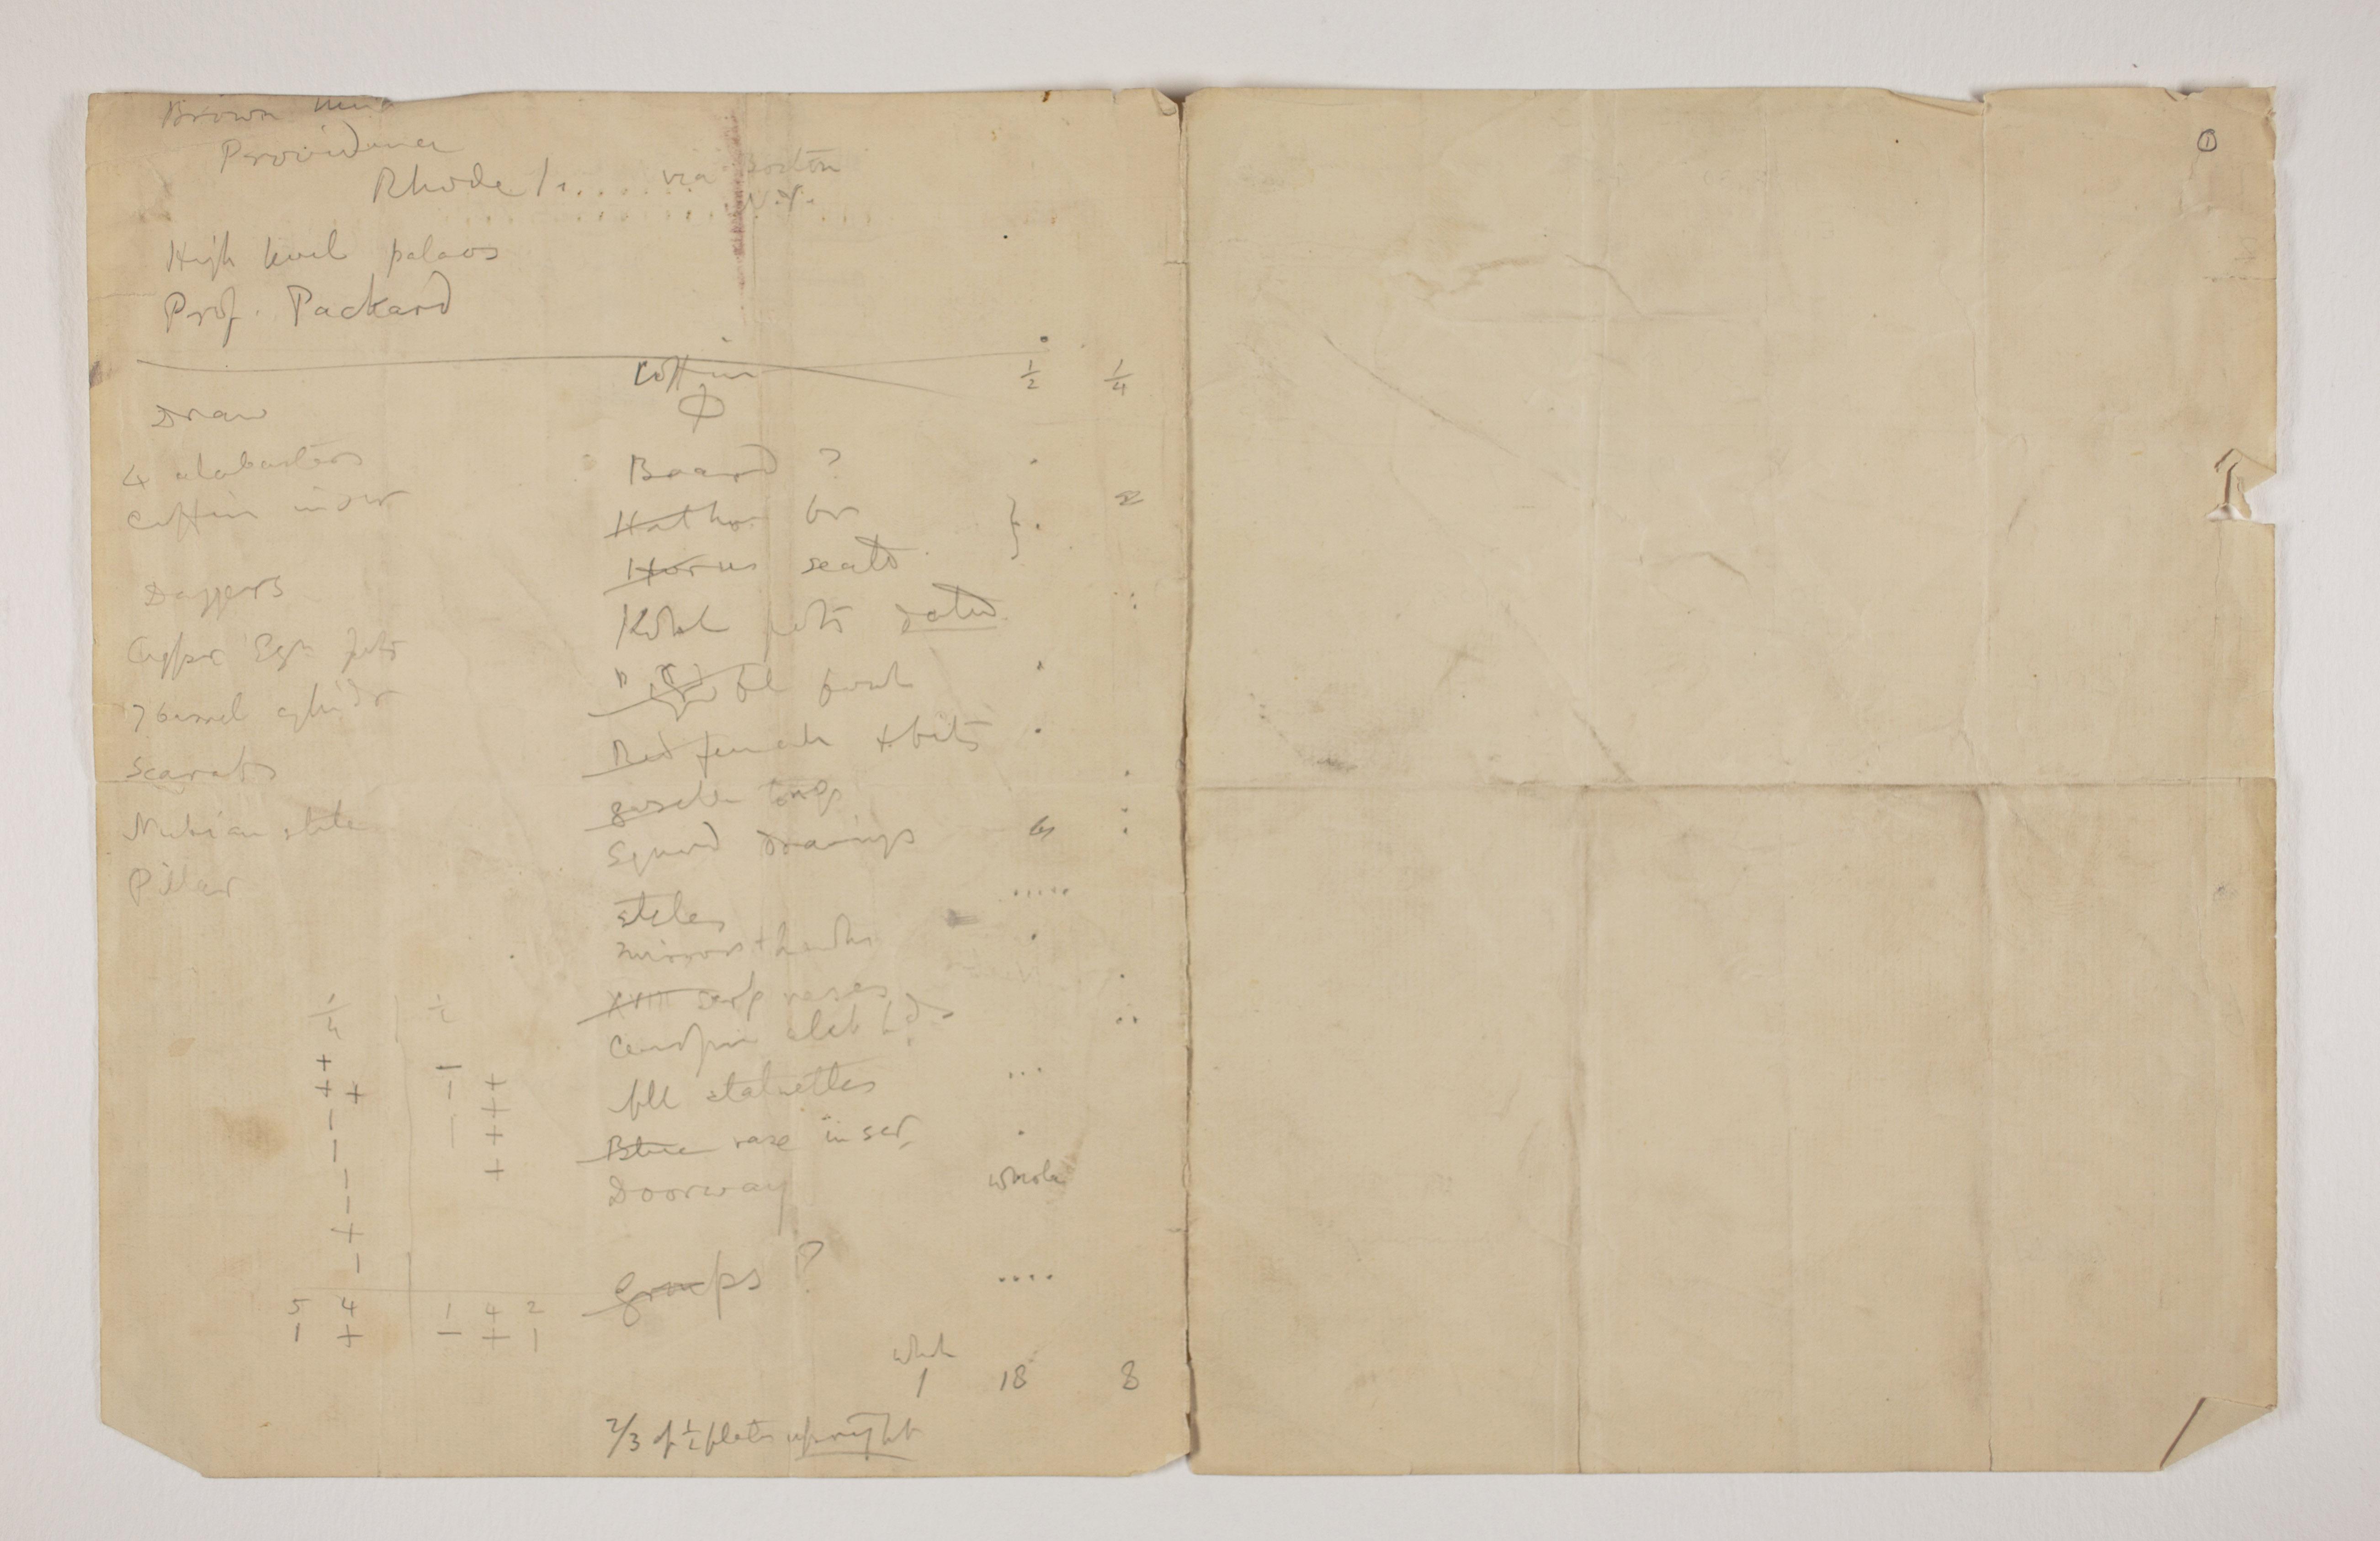 1899-1900 Abydos Object list  PMA/WFP1/D/8/1.1